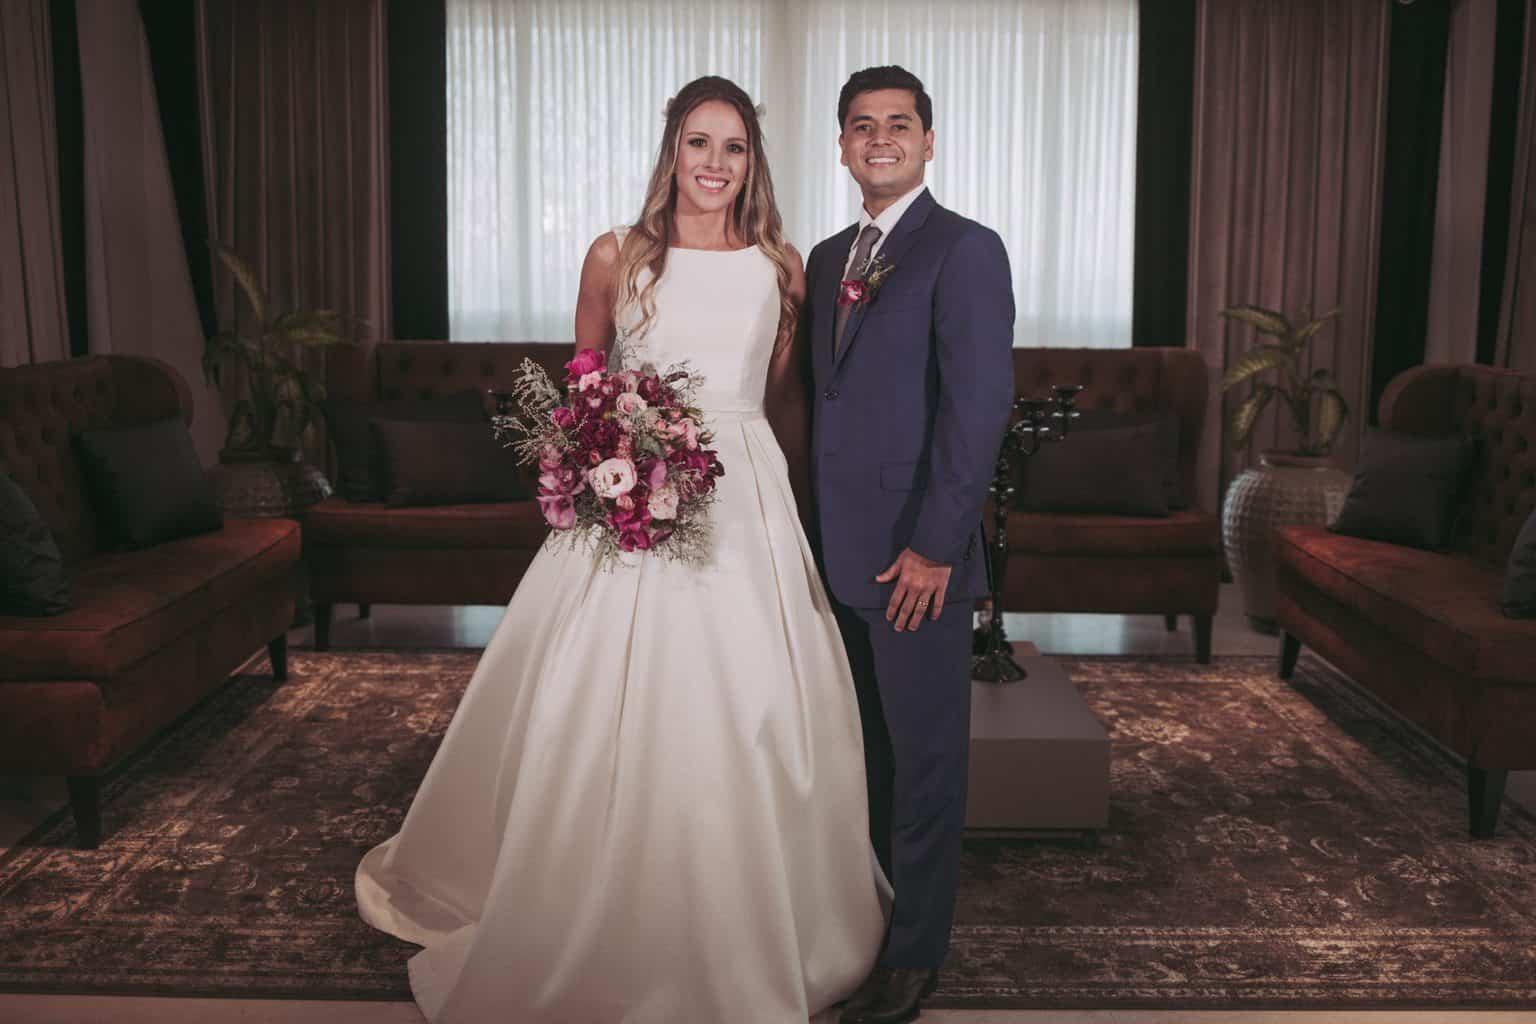 casamento-julia-e-guilherme-caseme-30